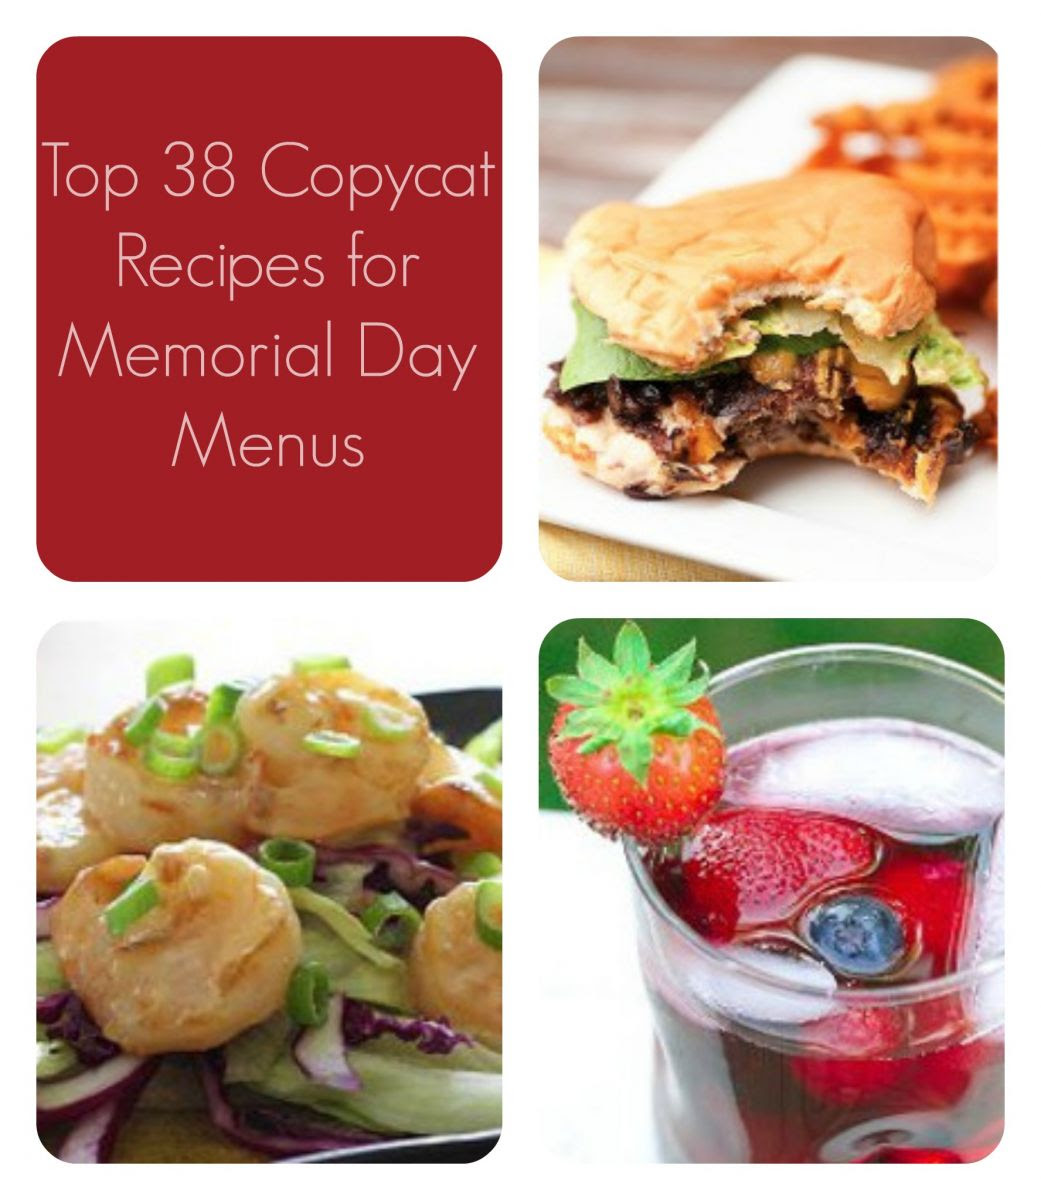 Top 38 Copycat Recip